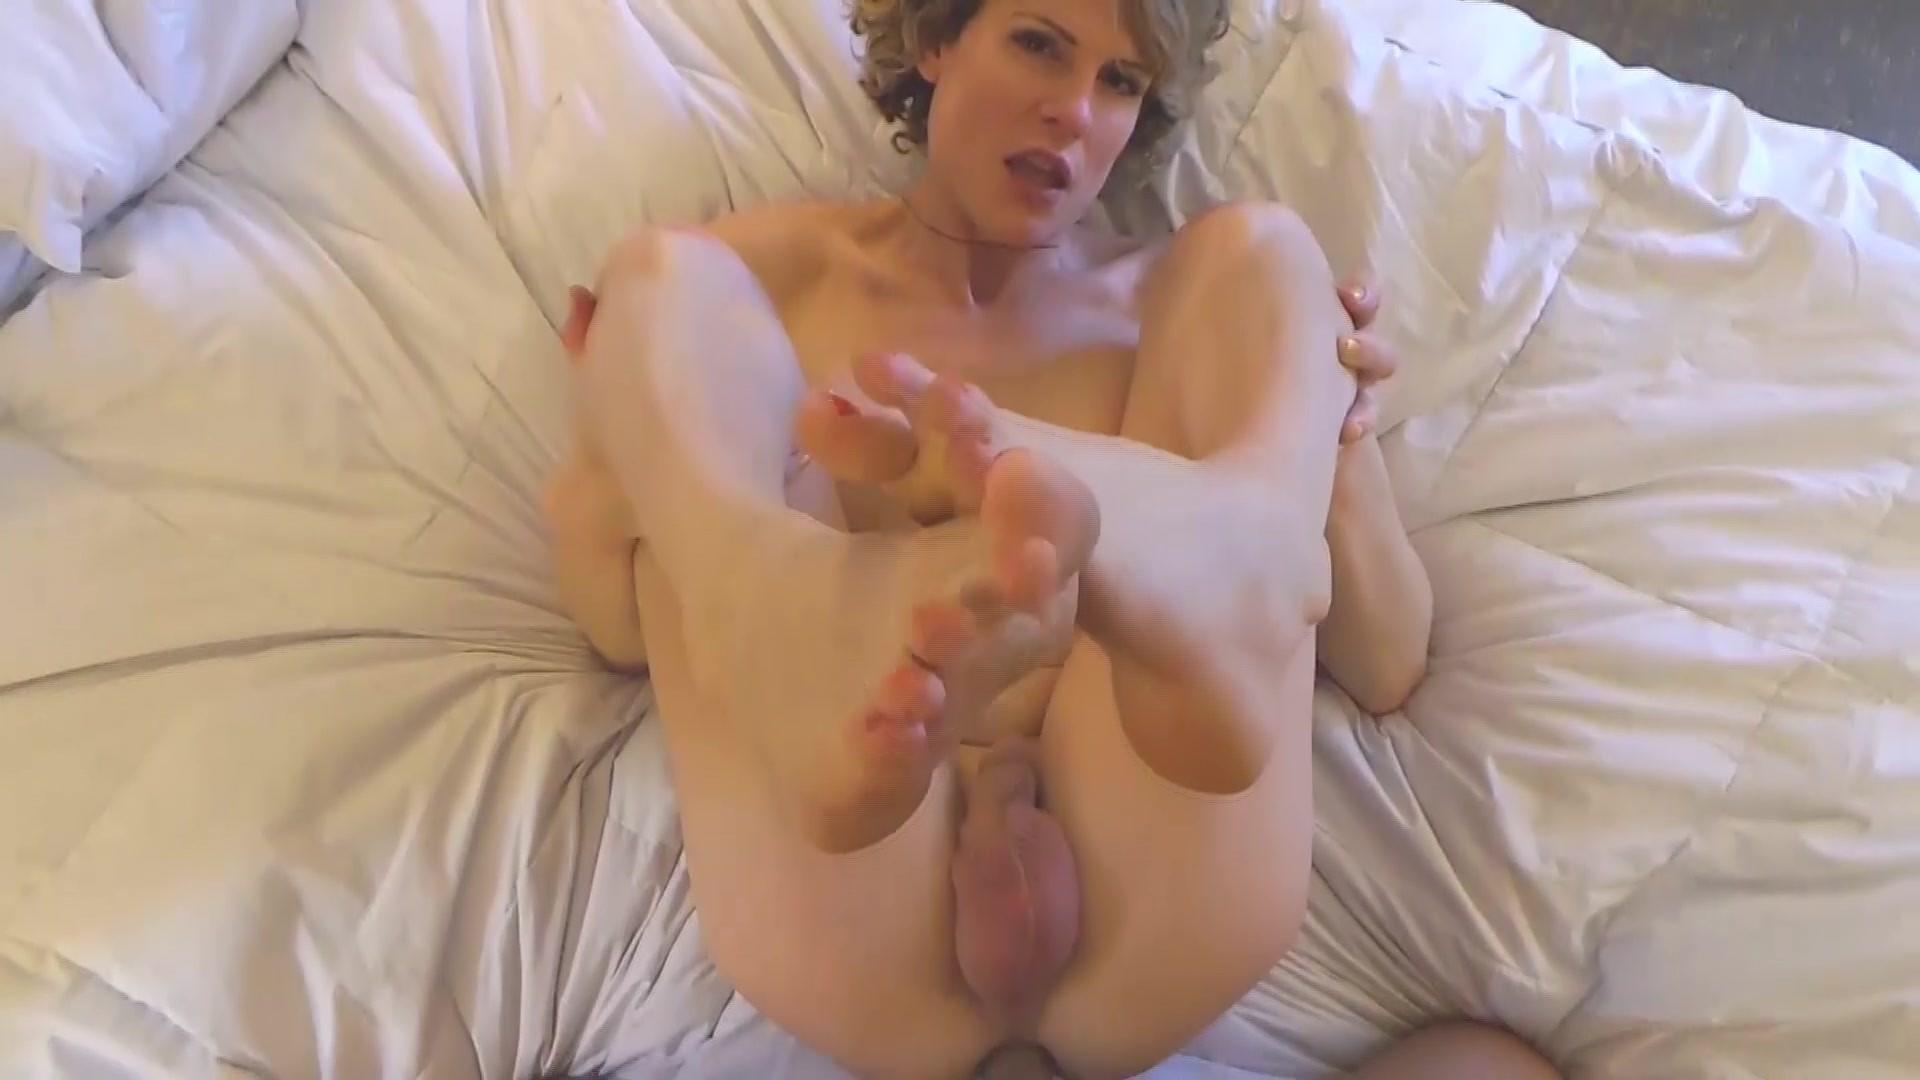 pov Watch transsexual